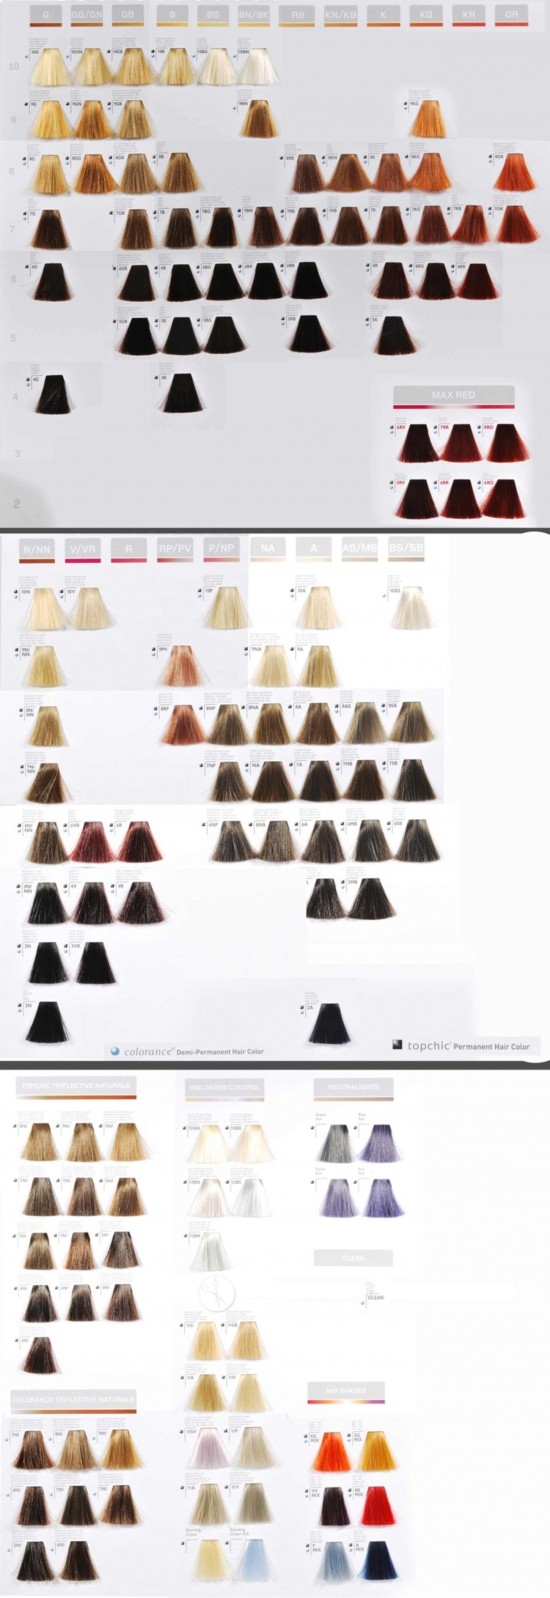 Палитра красок для волос Goldwell Topchic